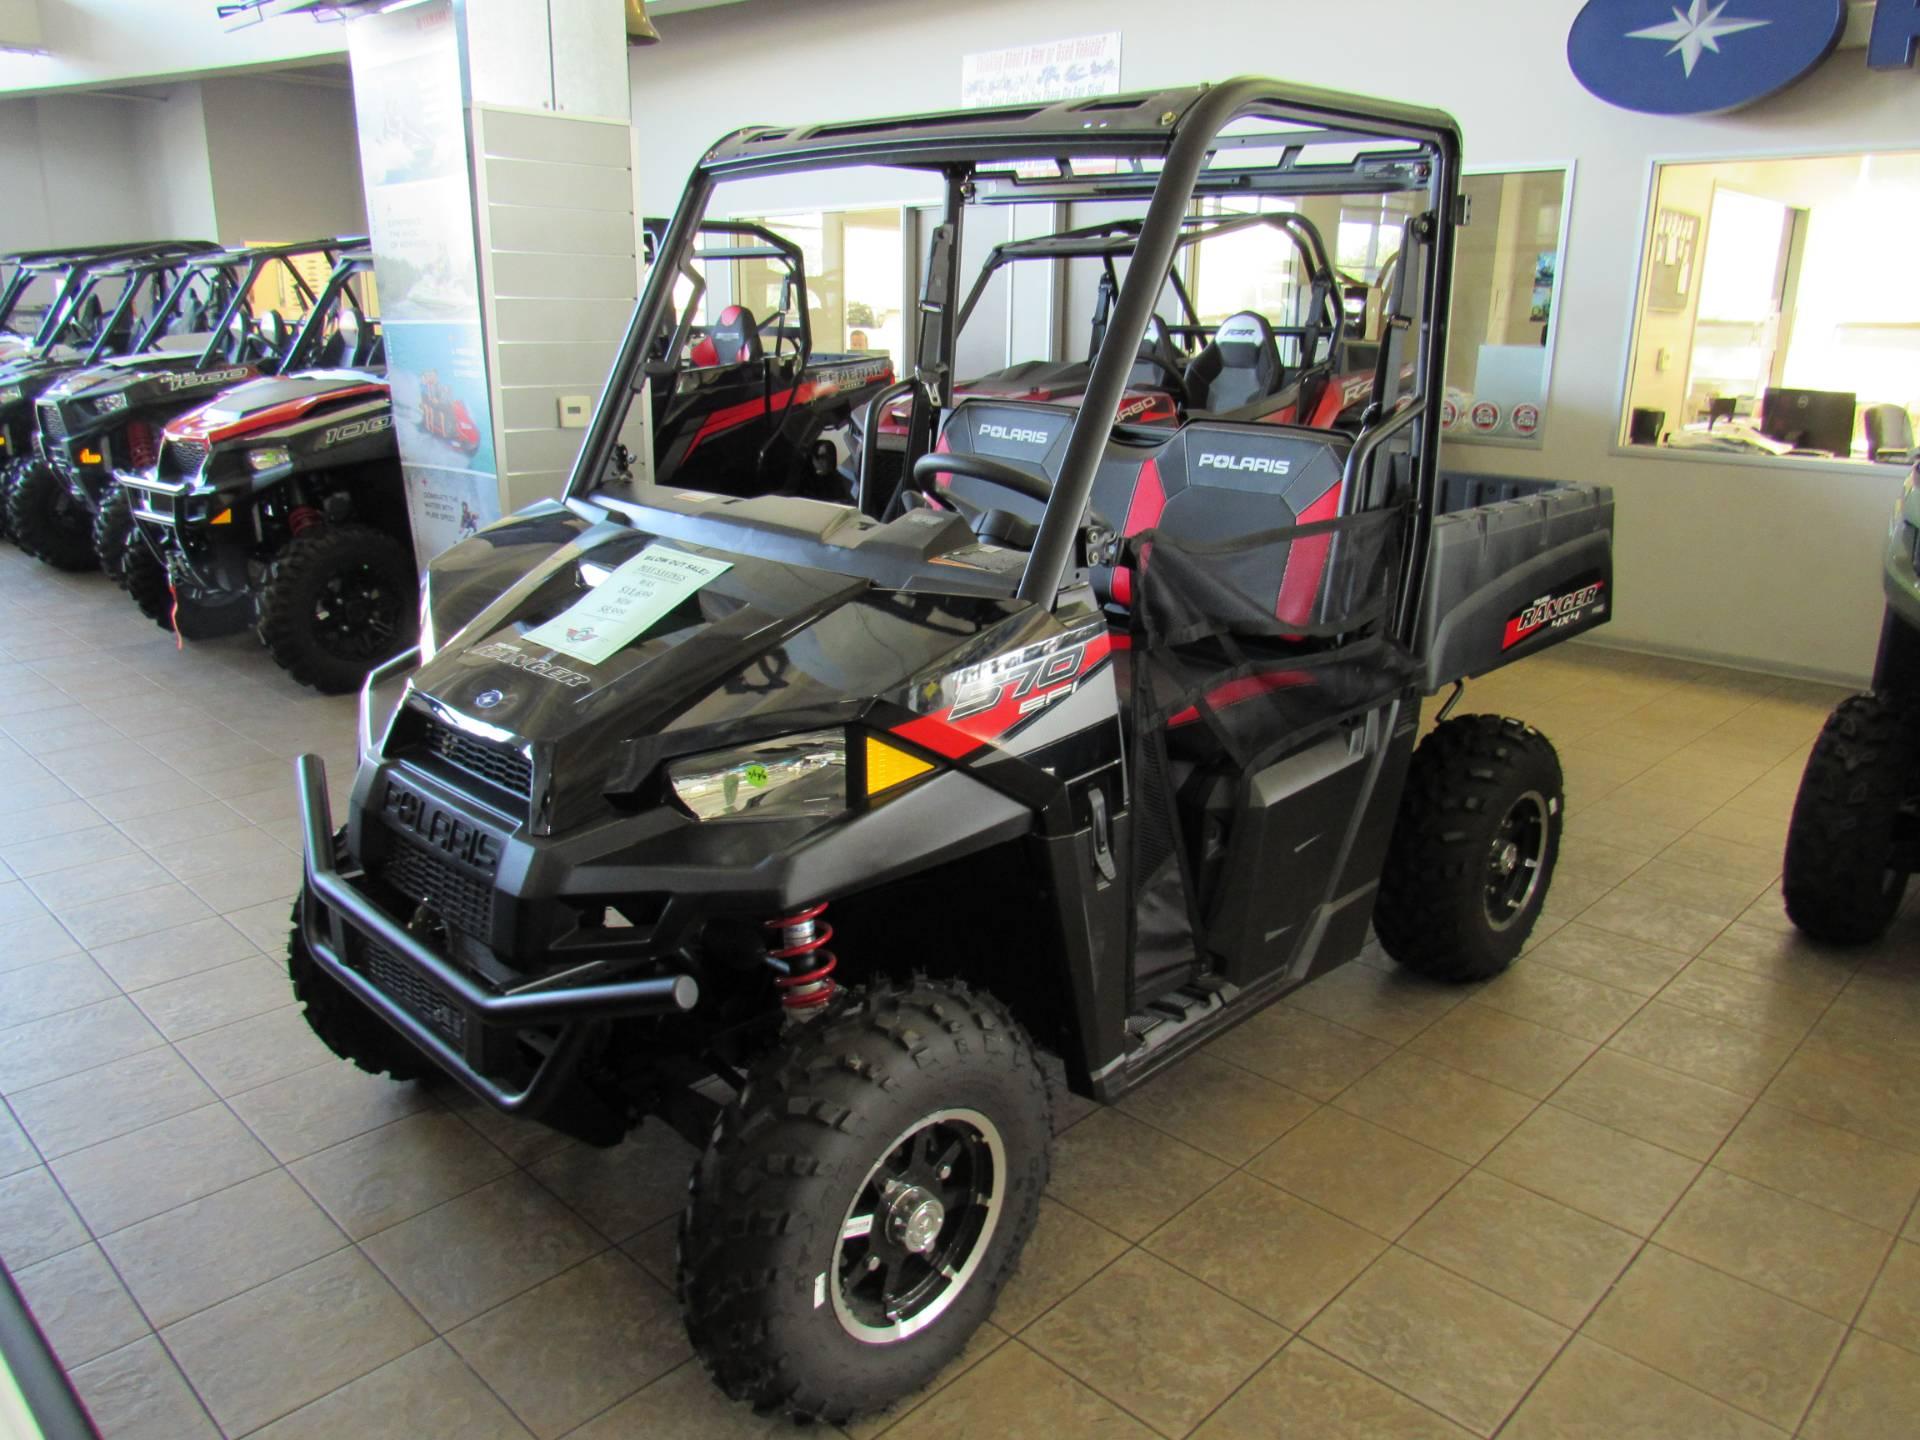 2017 Polaris Ranger 570 >> New 2017 Polaris Ranger 570 Eps Utility Vehicles In Irvine Ca